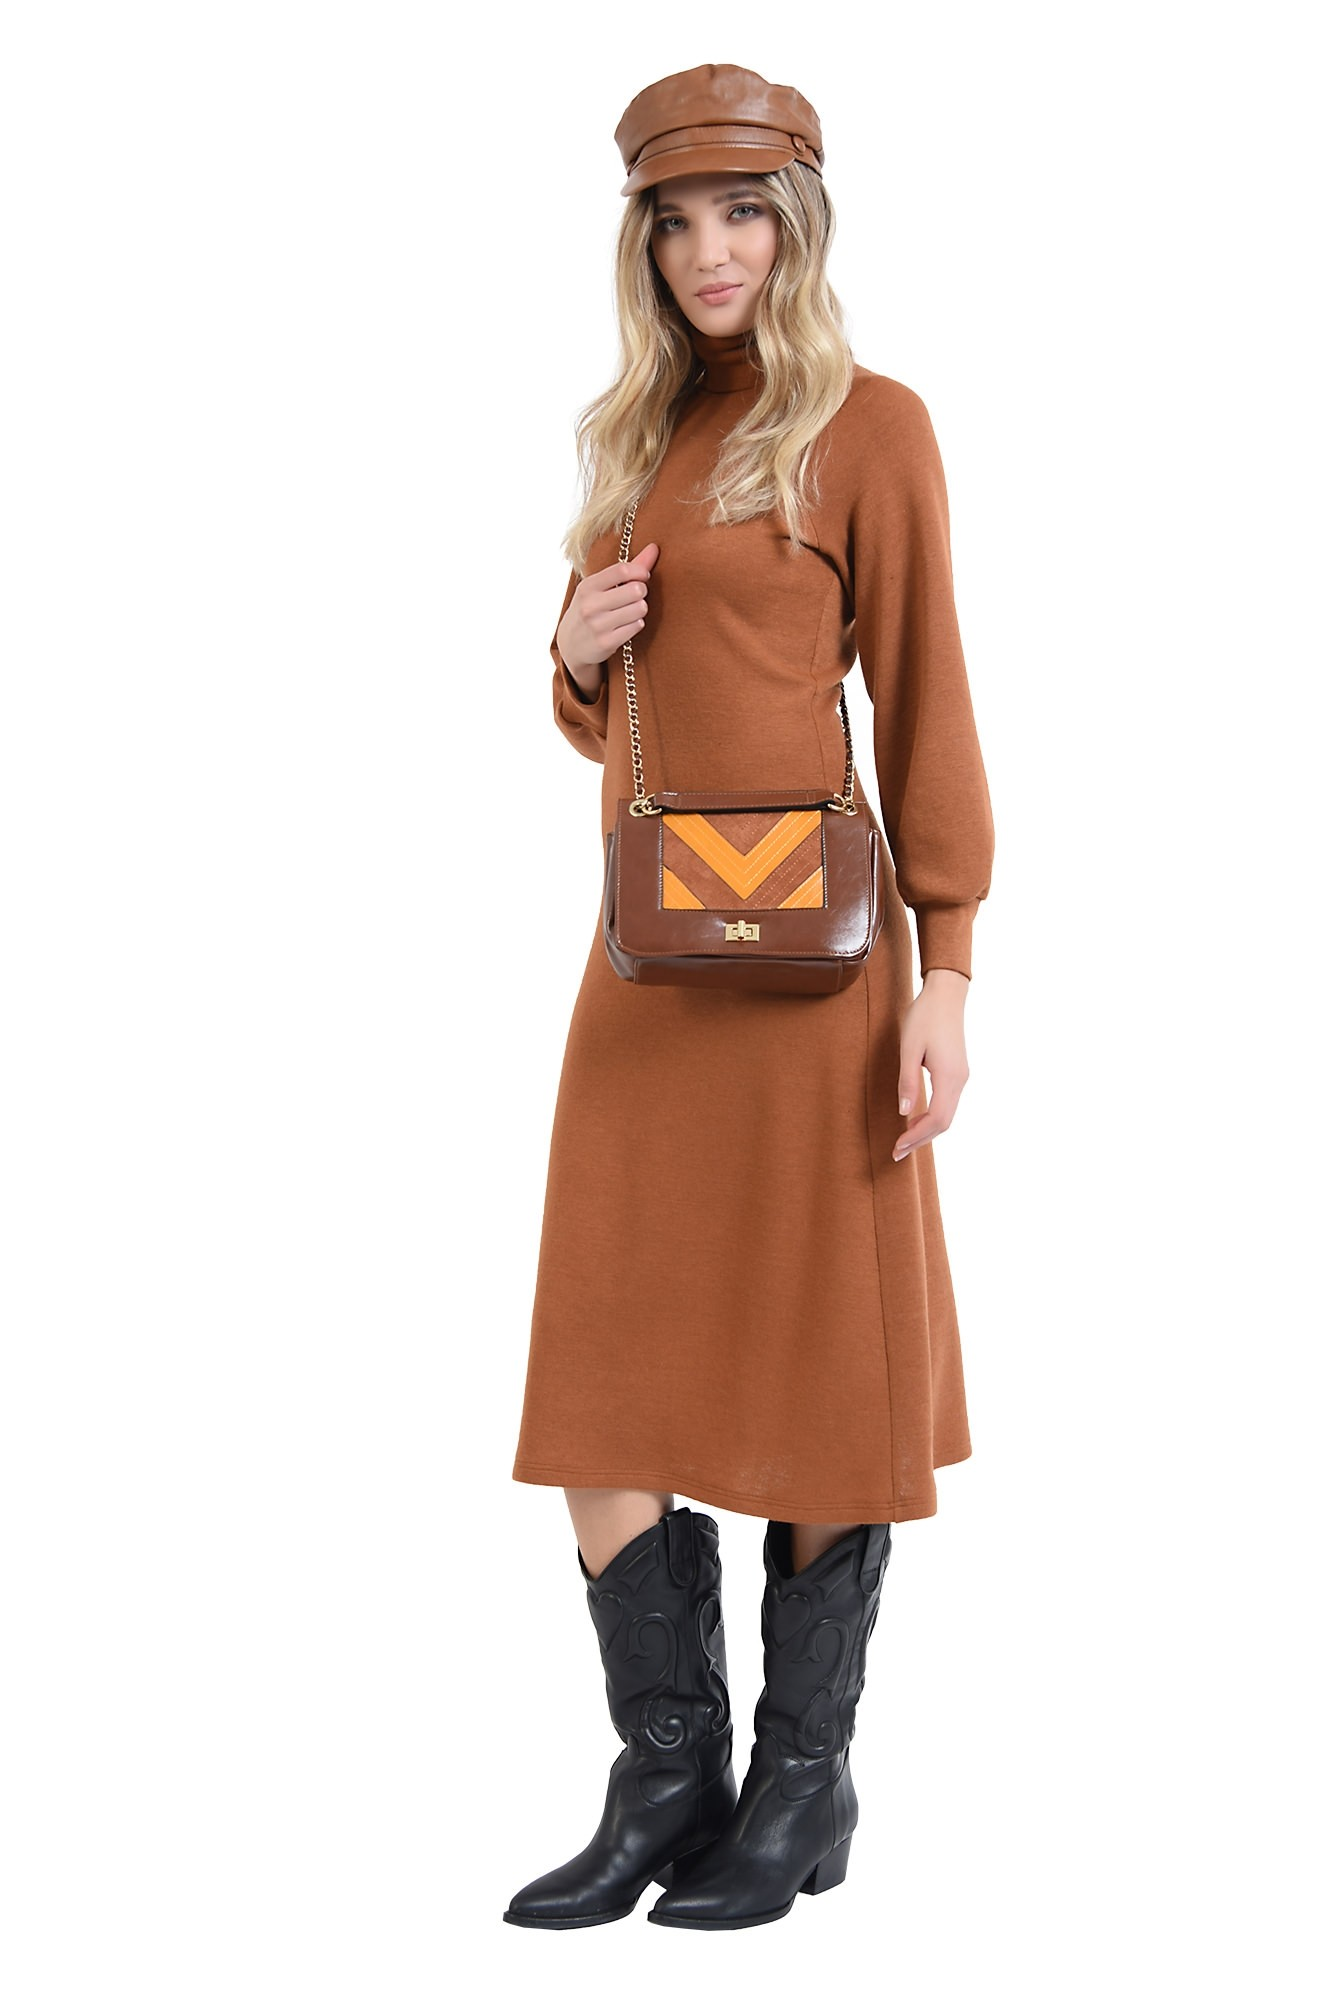 360 - rochie midi, evazata, din tricot, cu maneca bufanta